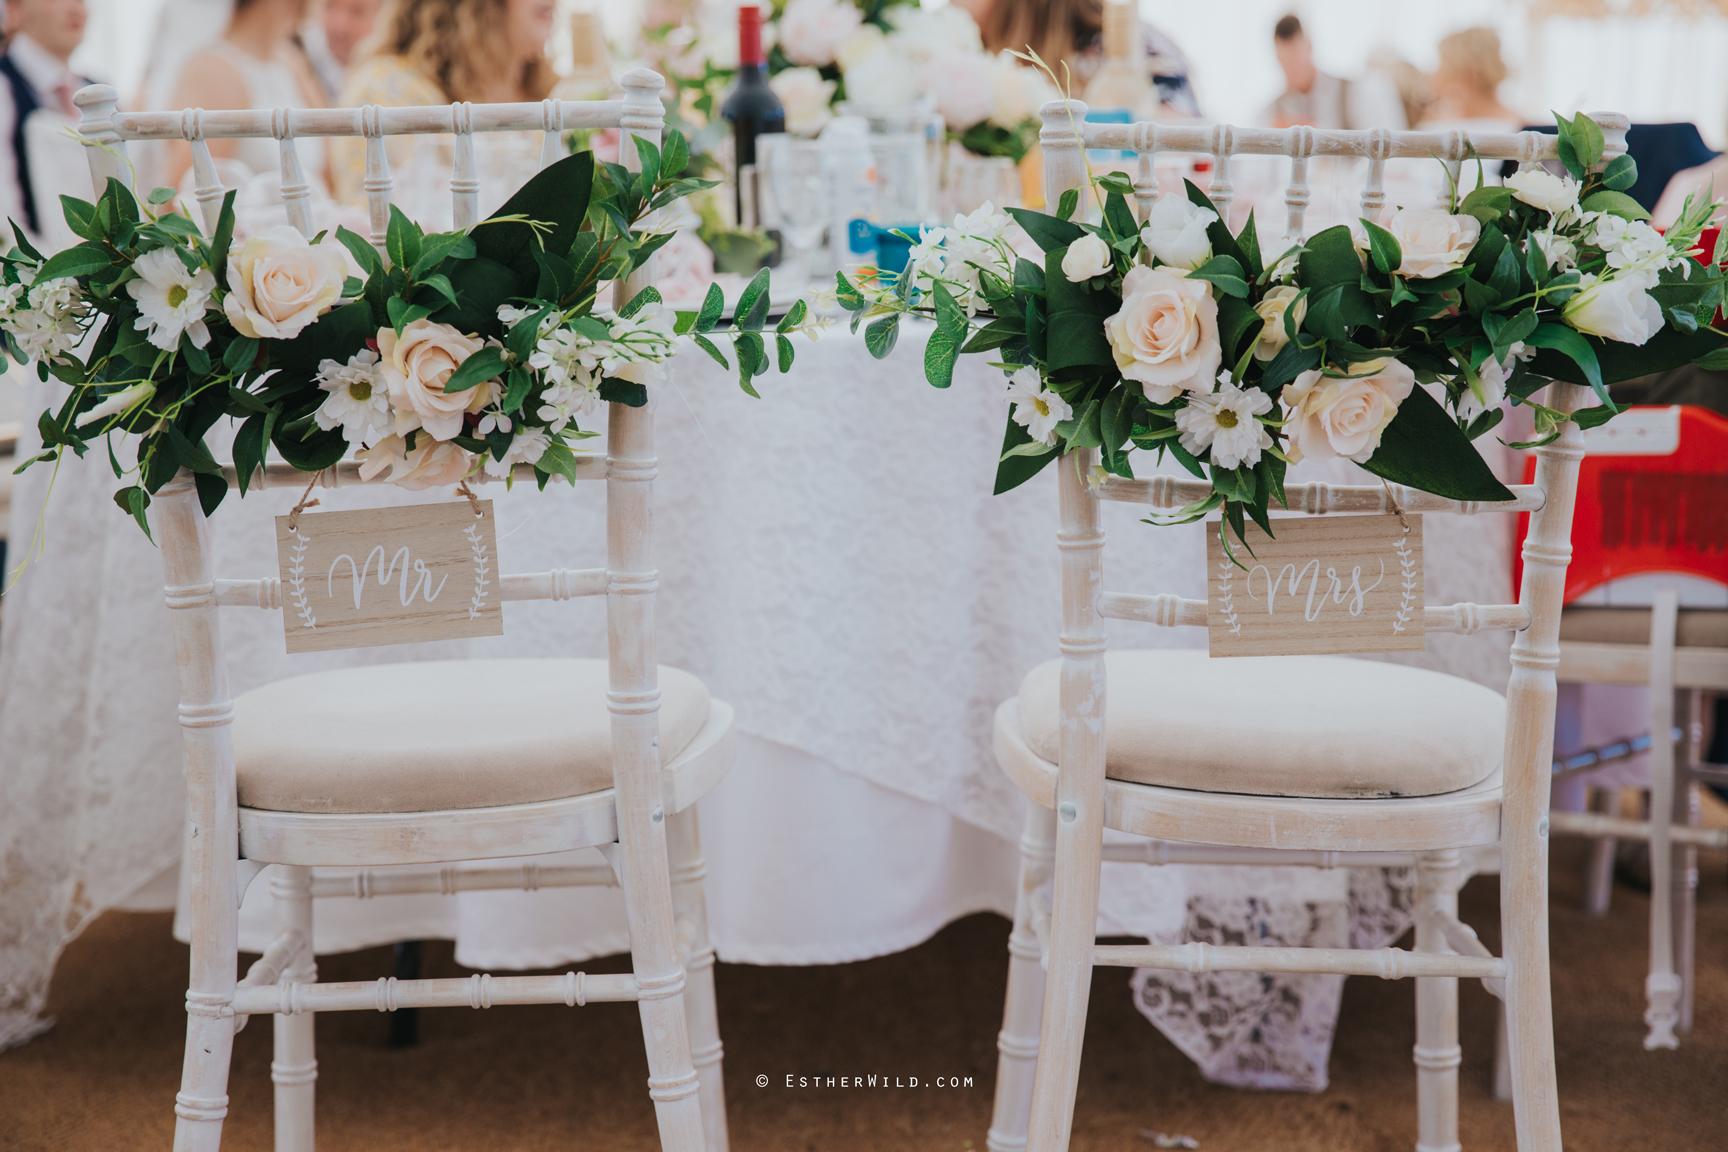 IMG_1706Walpole_St_Andrew_Church_Norfolk_Wedding_Copyright_Esther_Wild_Photographer_.jpg